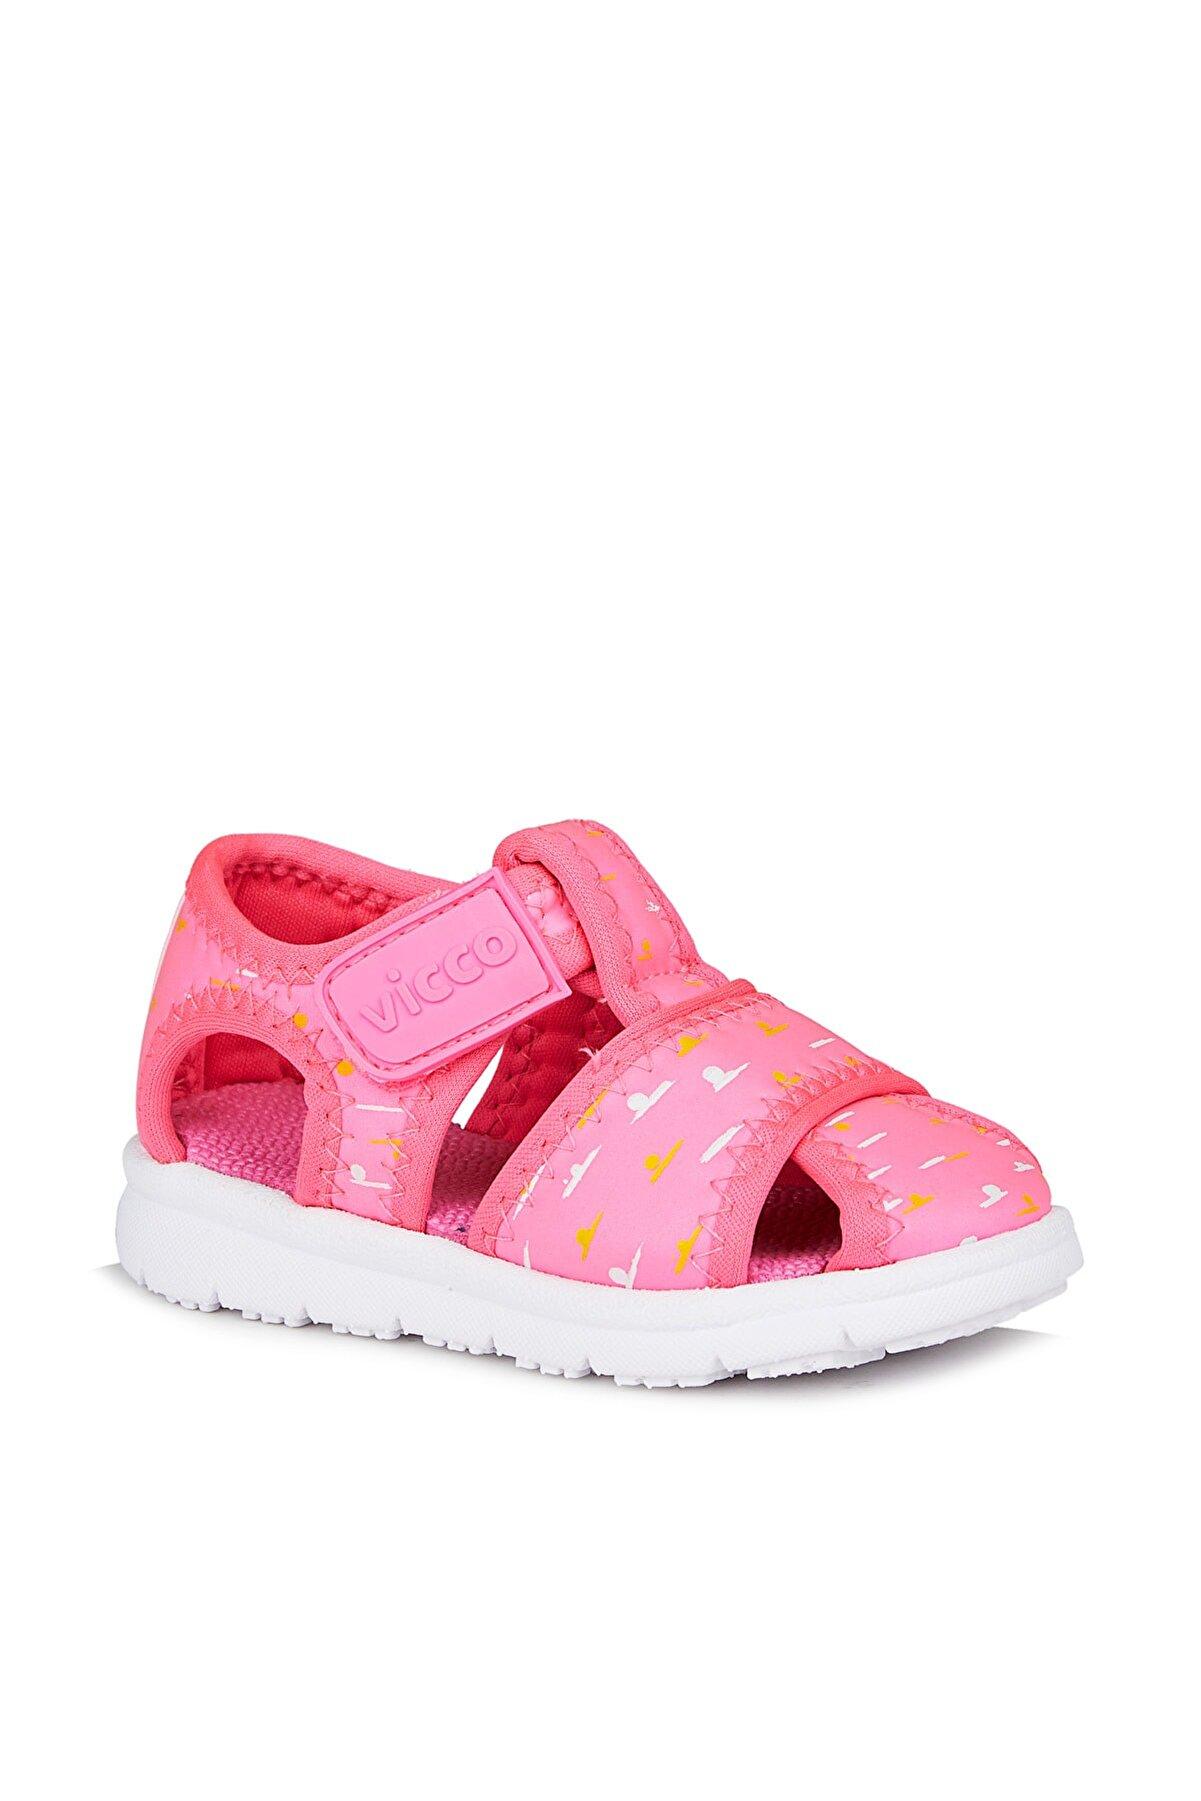 Vicco Bumba Kız Çocuk Fuşya Sandalet